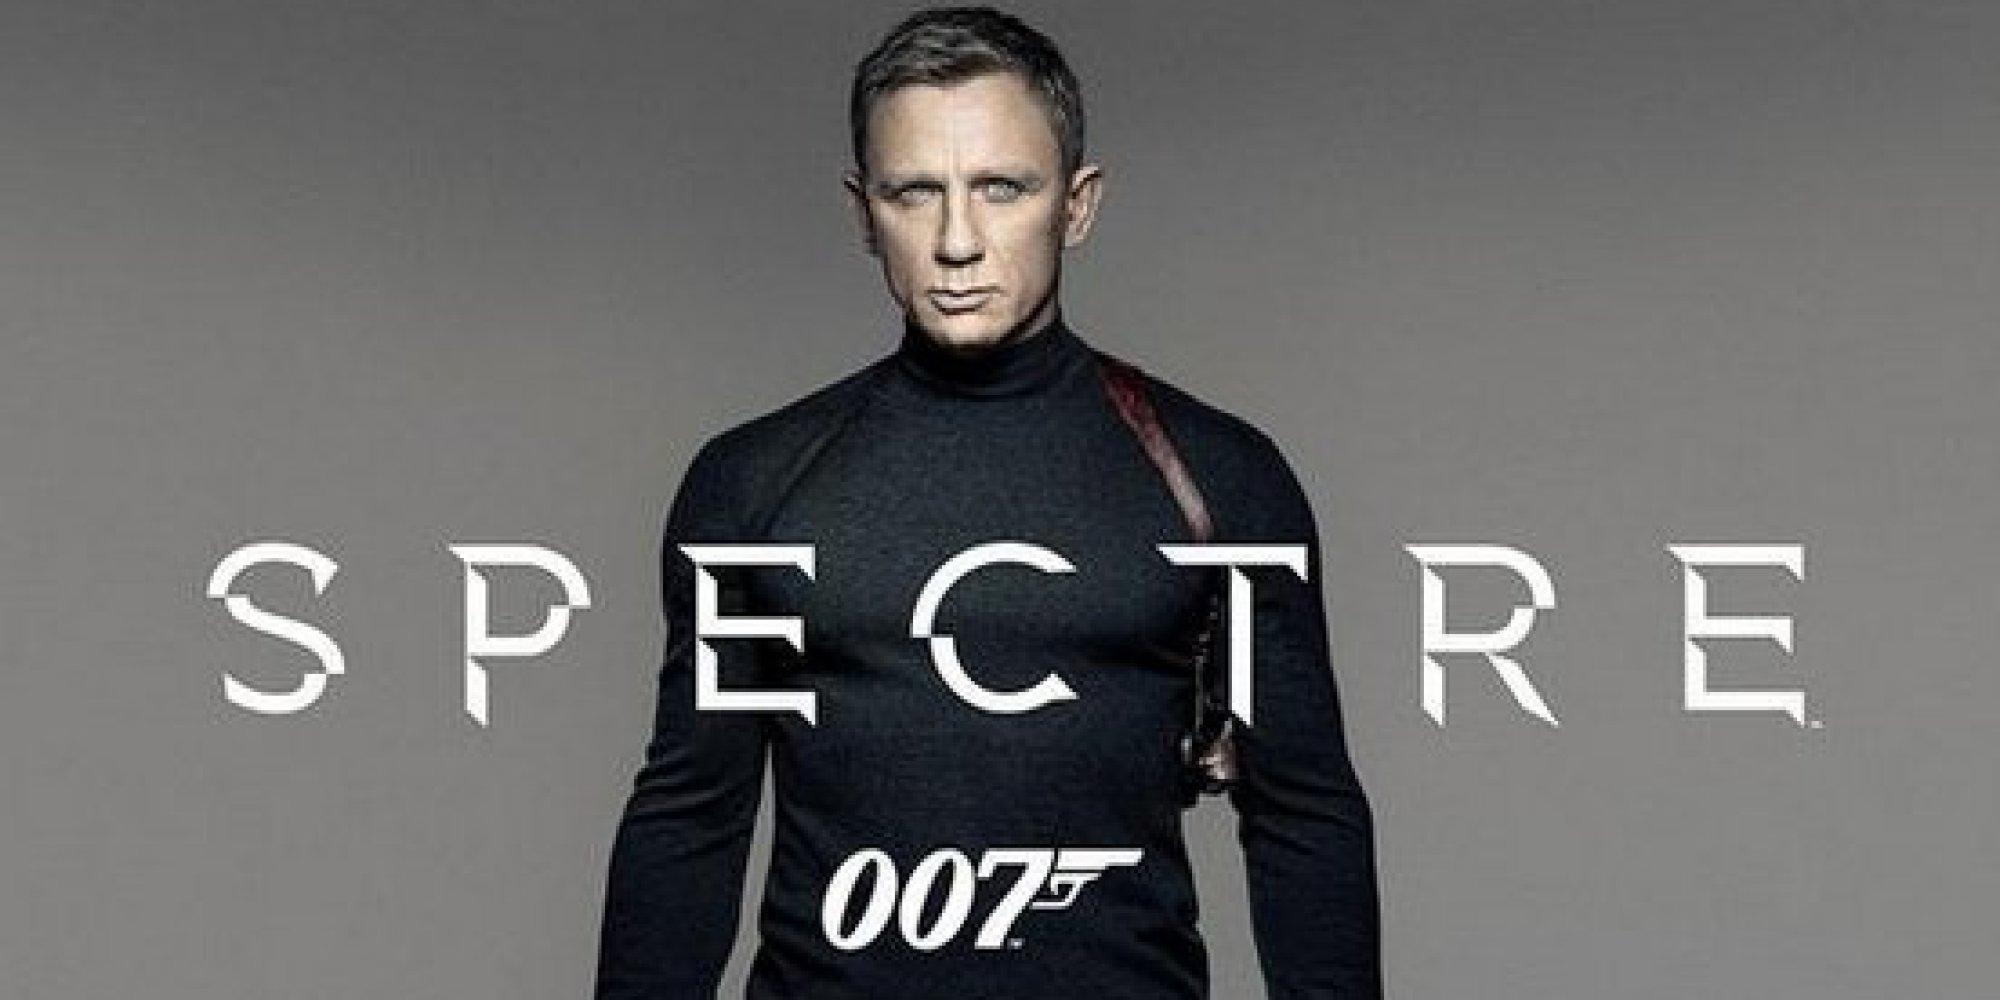 I'm Bond…. James Bond